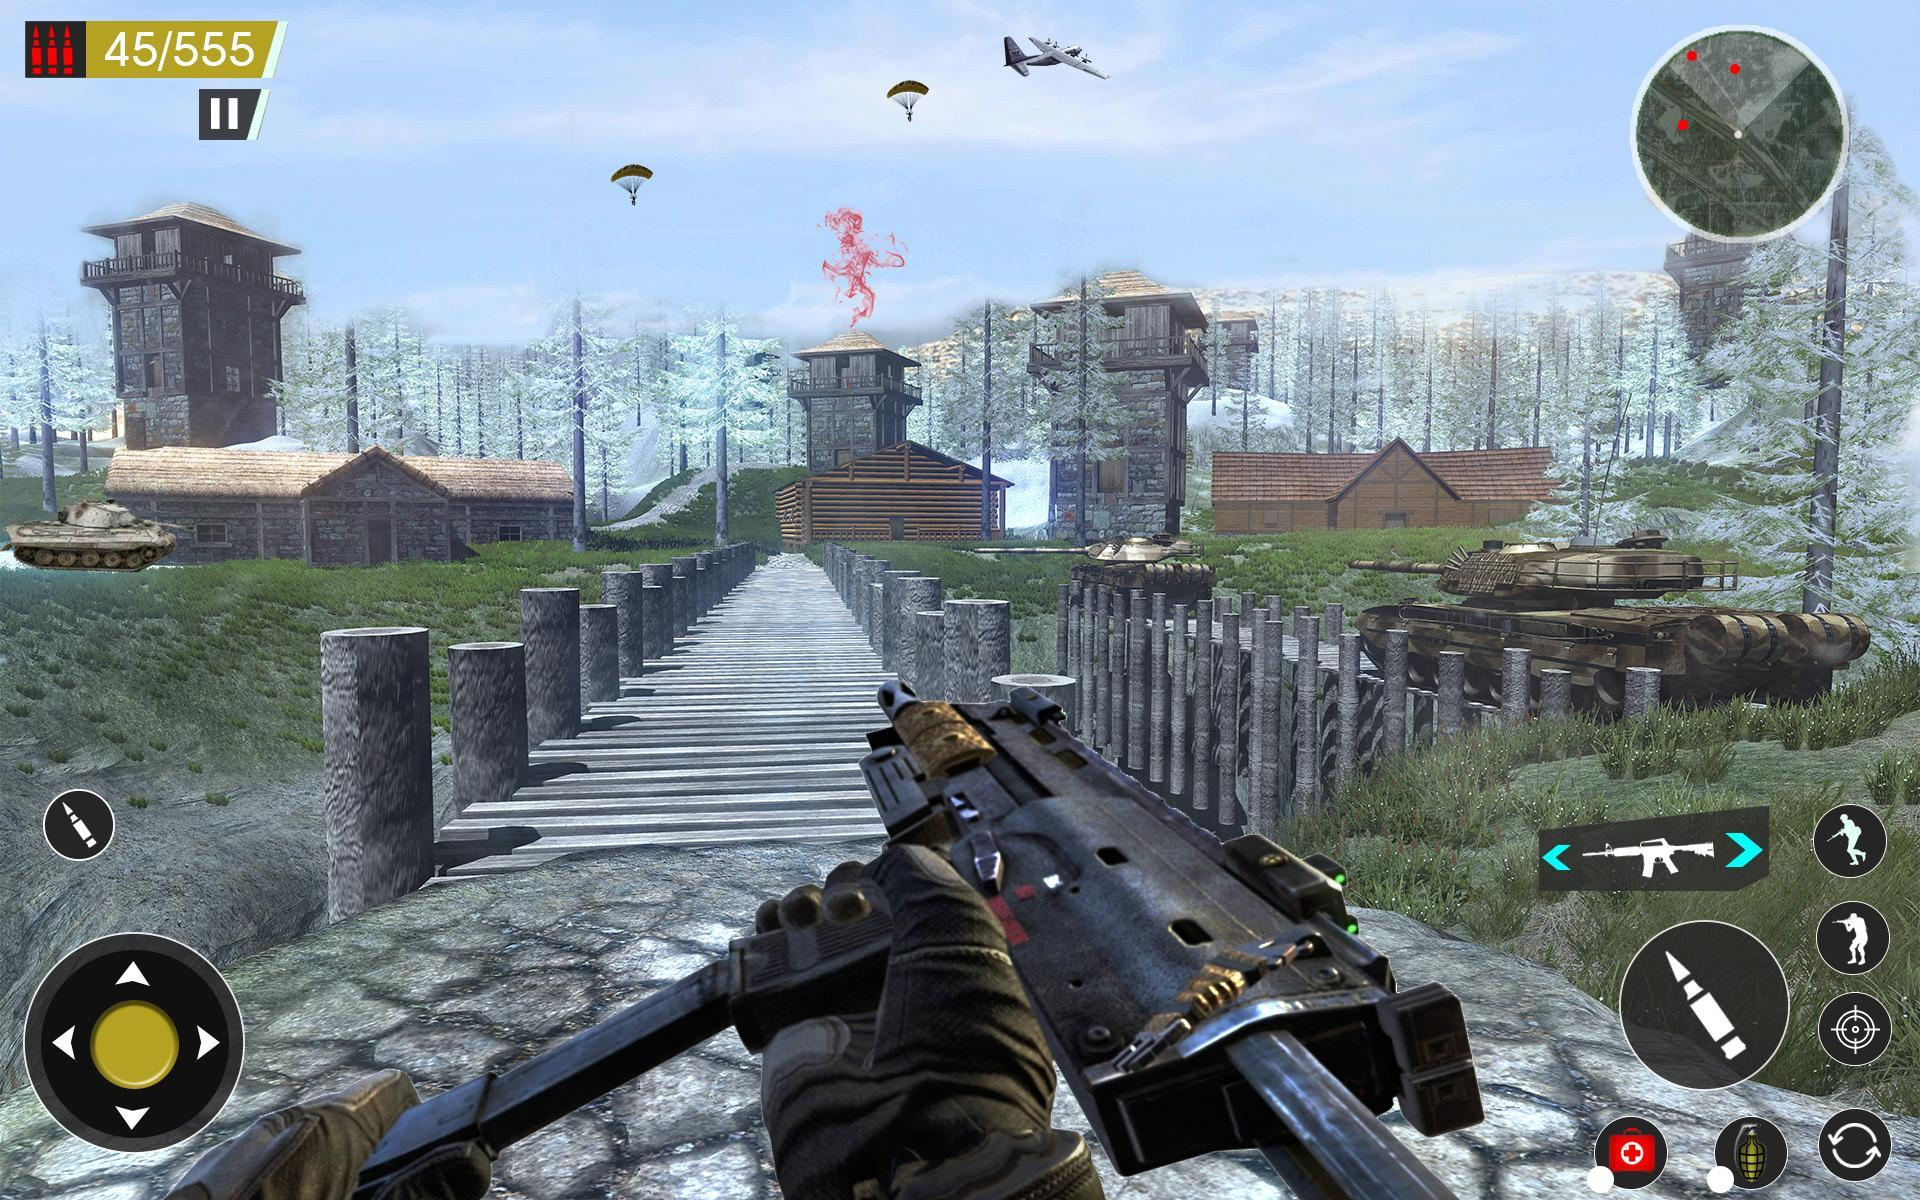 American World War Fps Shooter Free Shooting Games 4.8 Screenshot 19